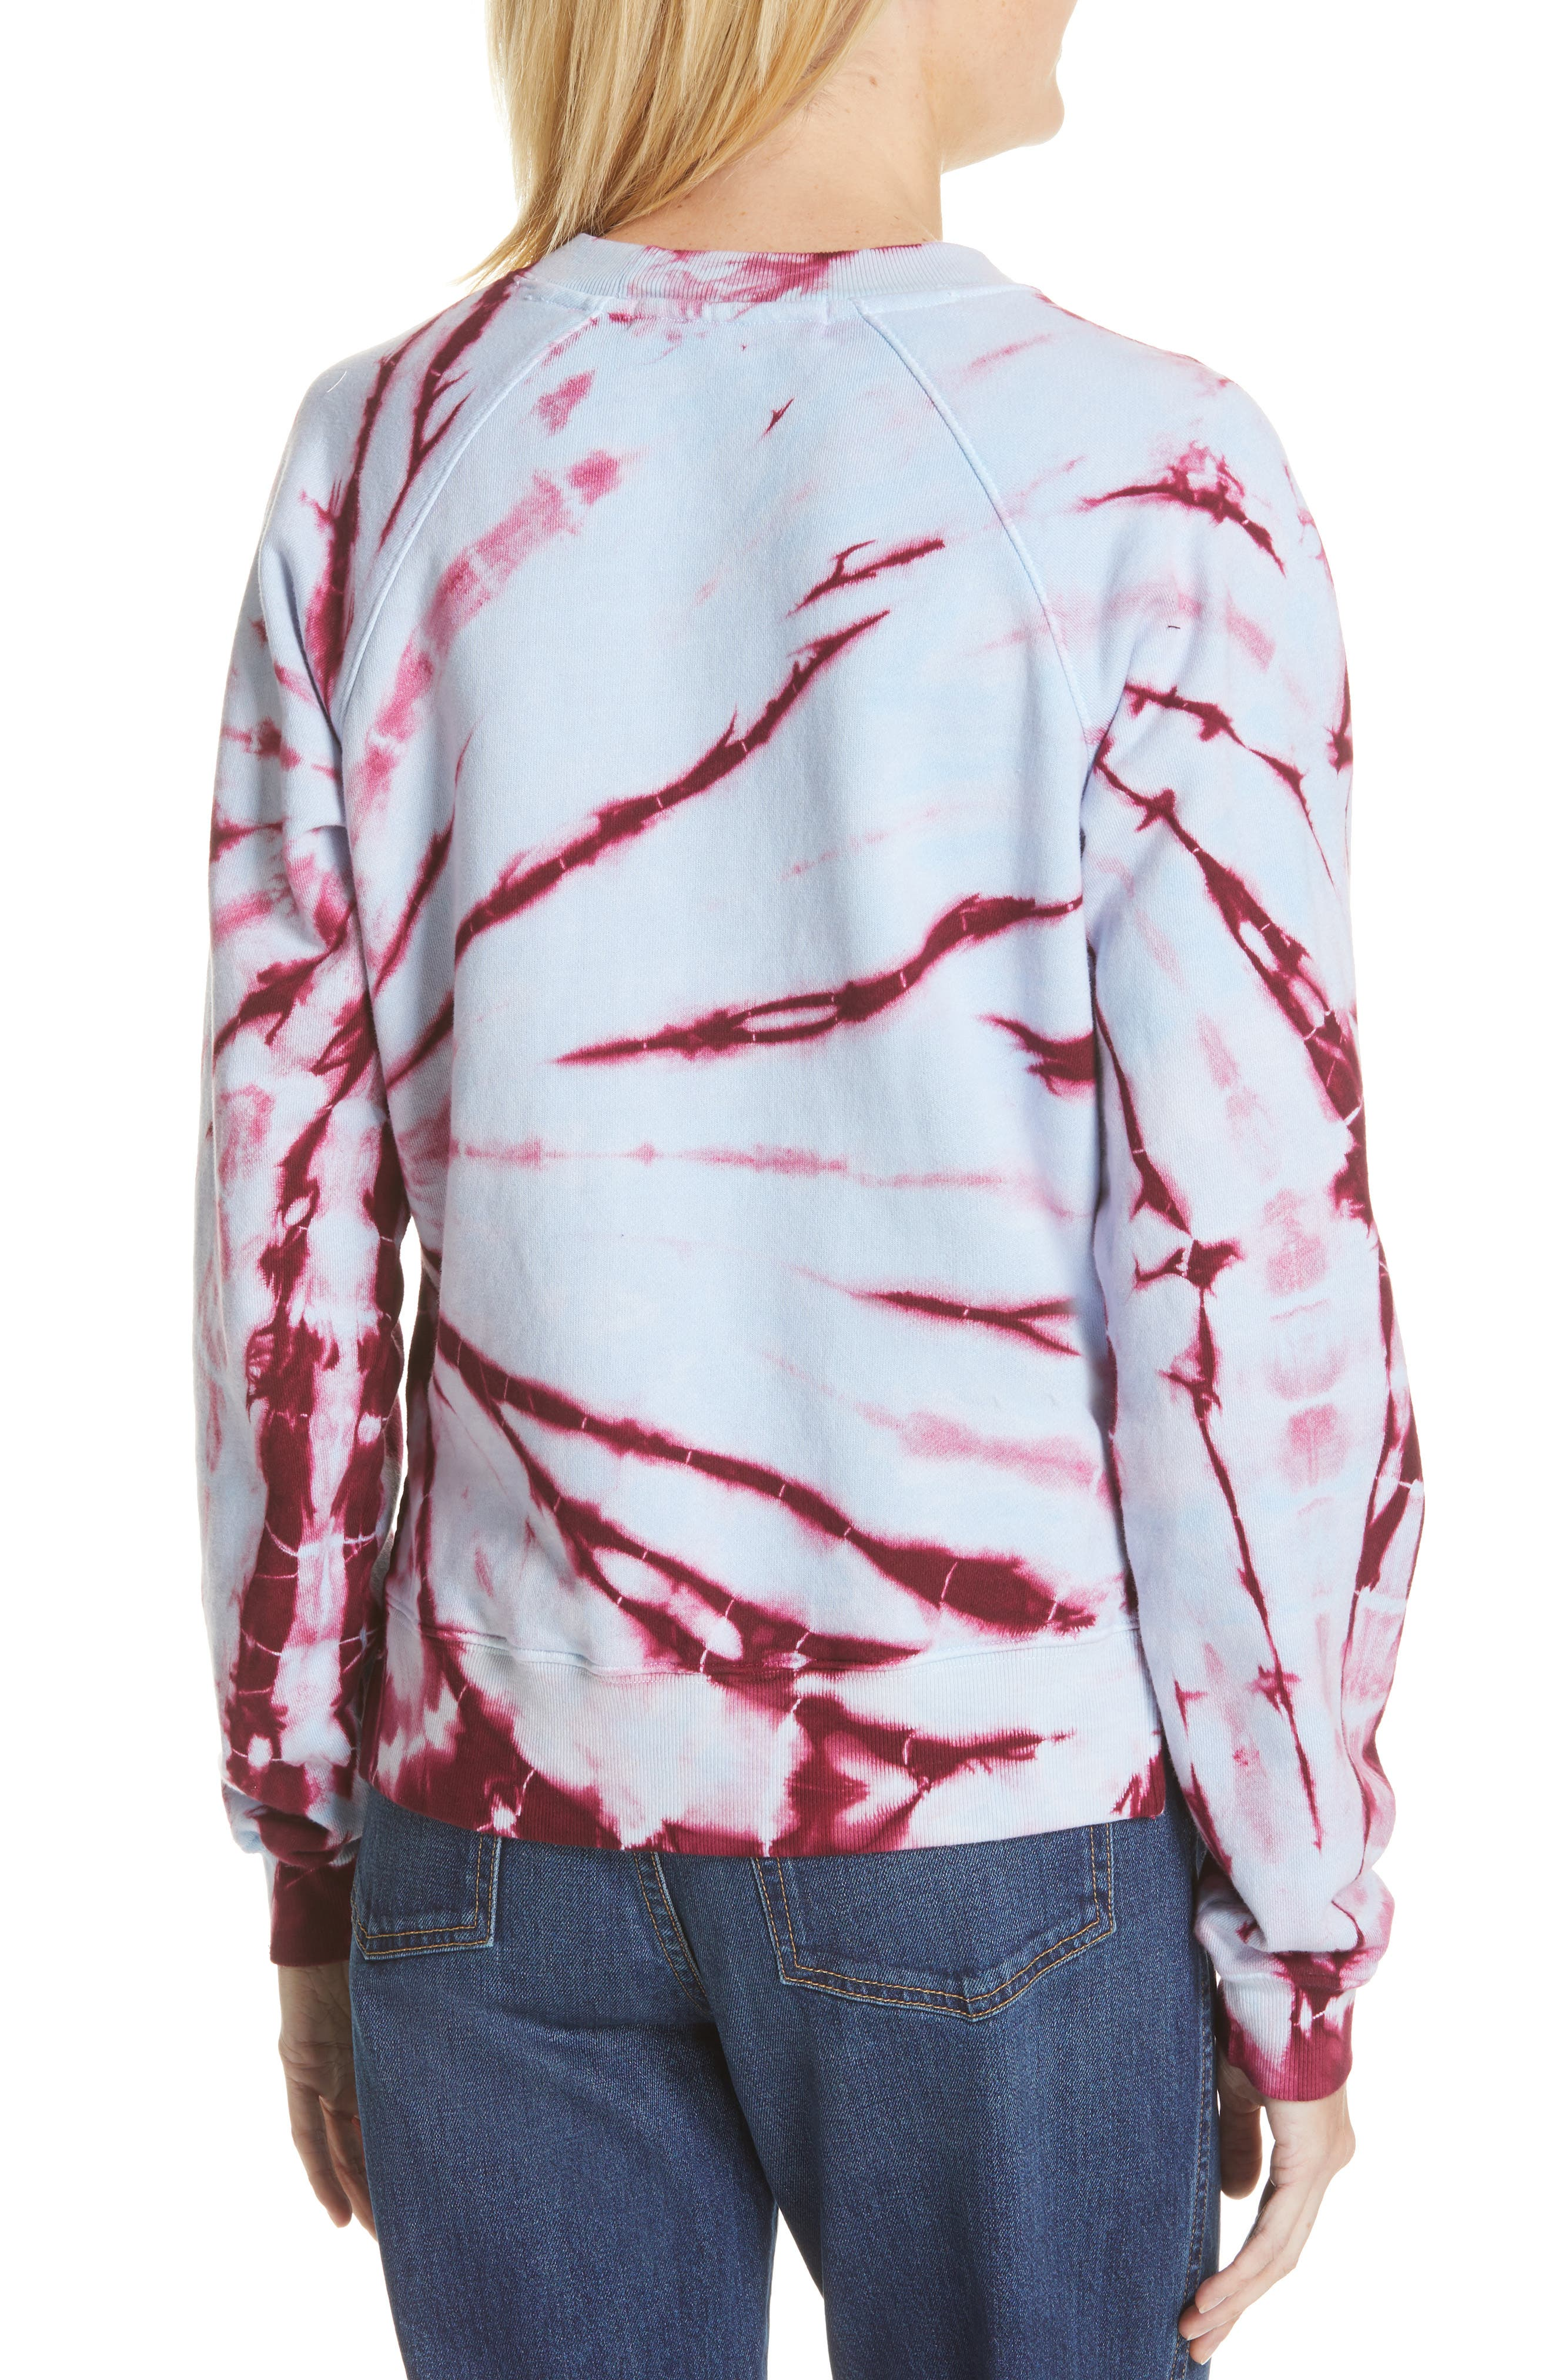 PROENZA SCHOULER, PSWL Tie Dye Sweatshirt, Alternate thumbnail 2, color, BABY BLUE/ RED TIE DYE